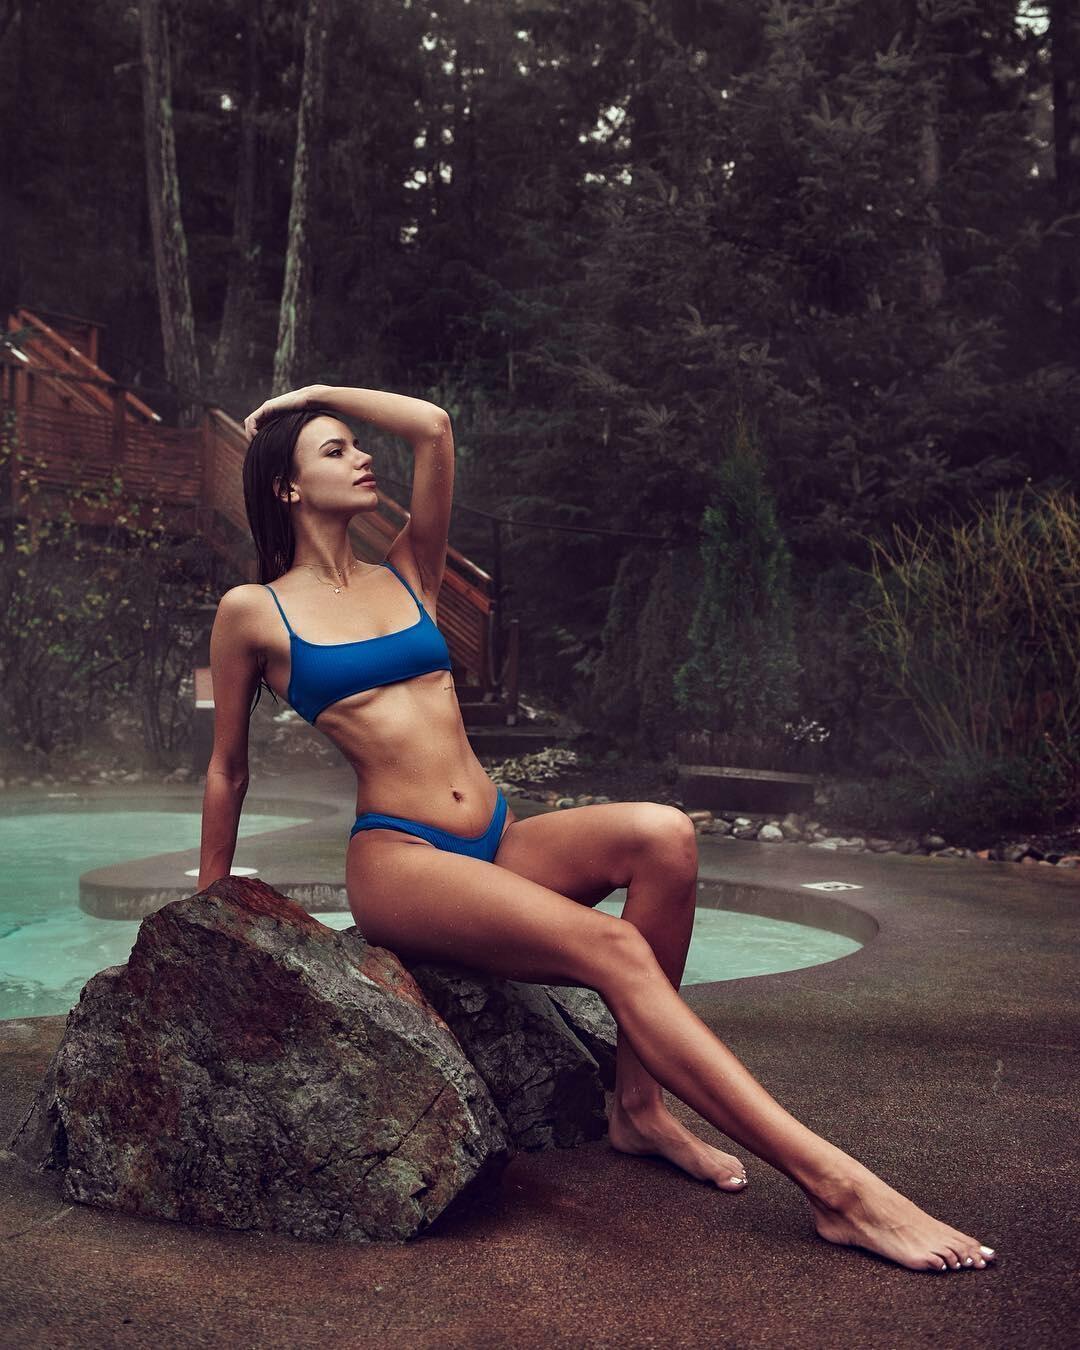 Communication on this topic: Shanta De Keuning Hot, madison-reed-leaked-59-photos/